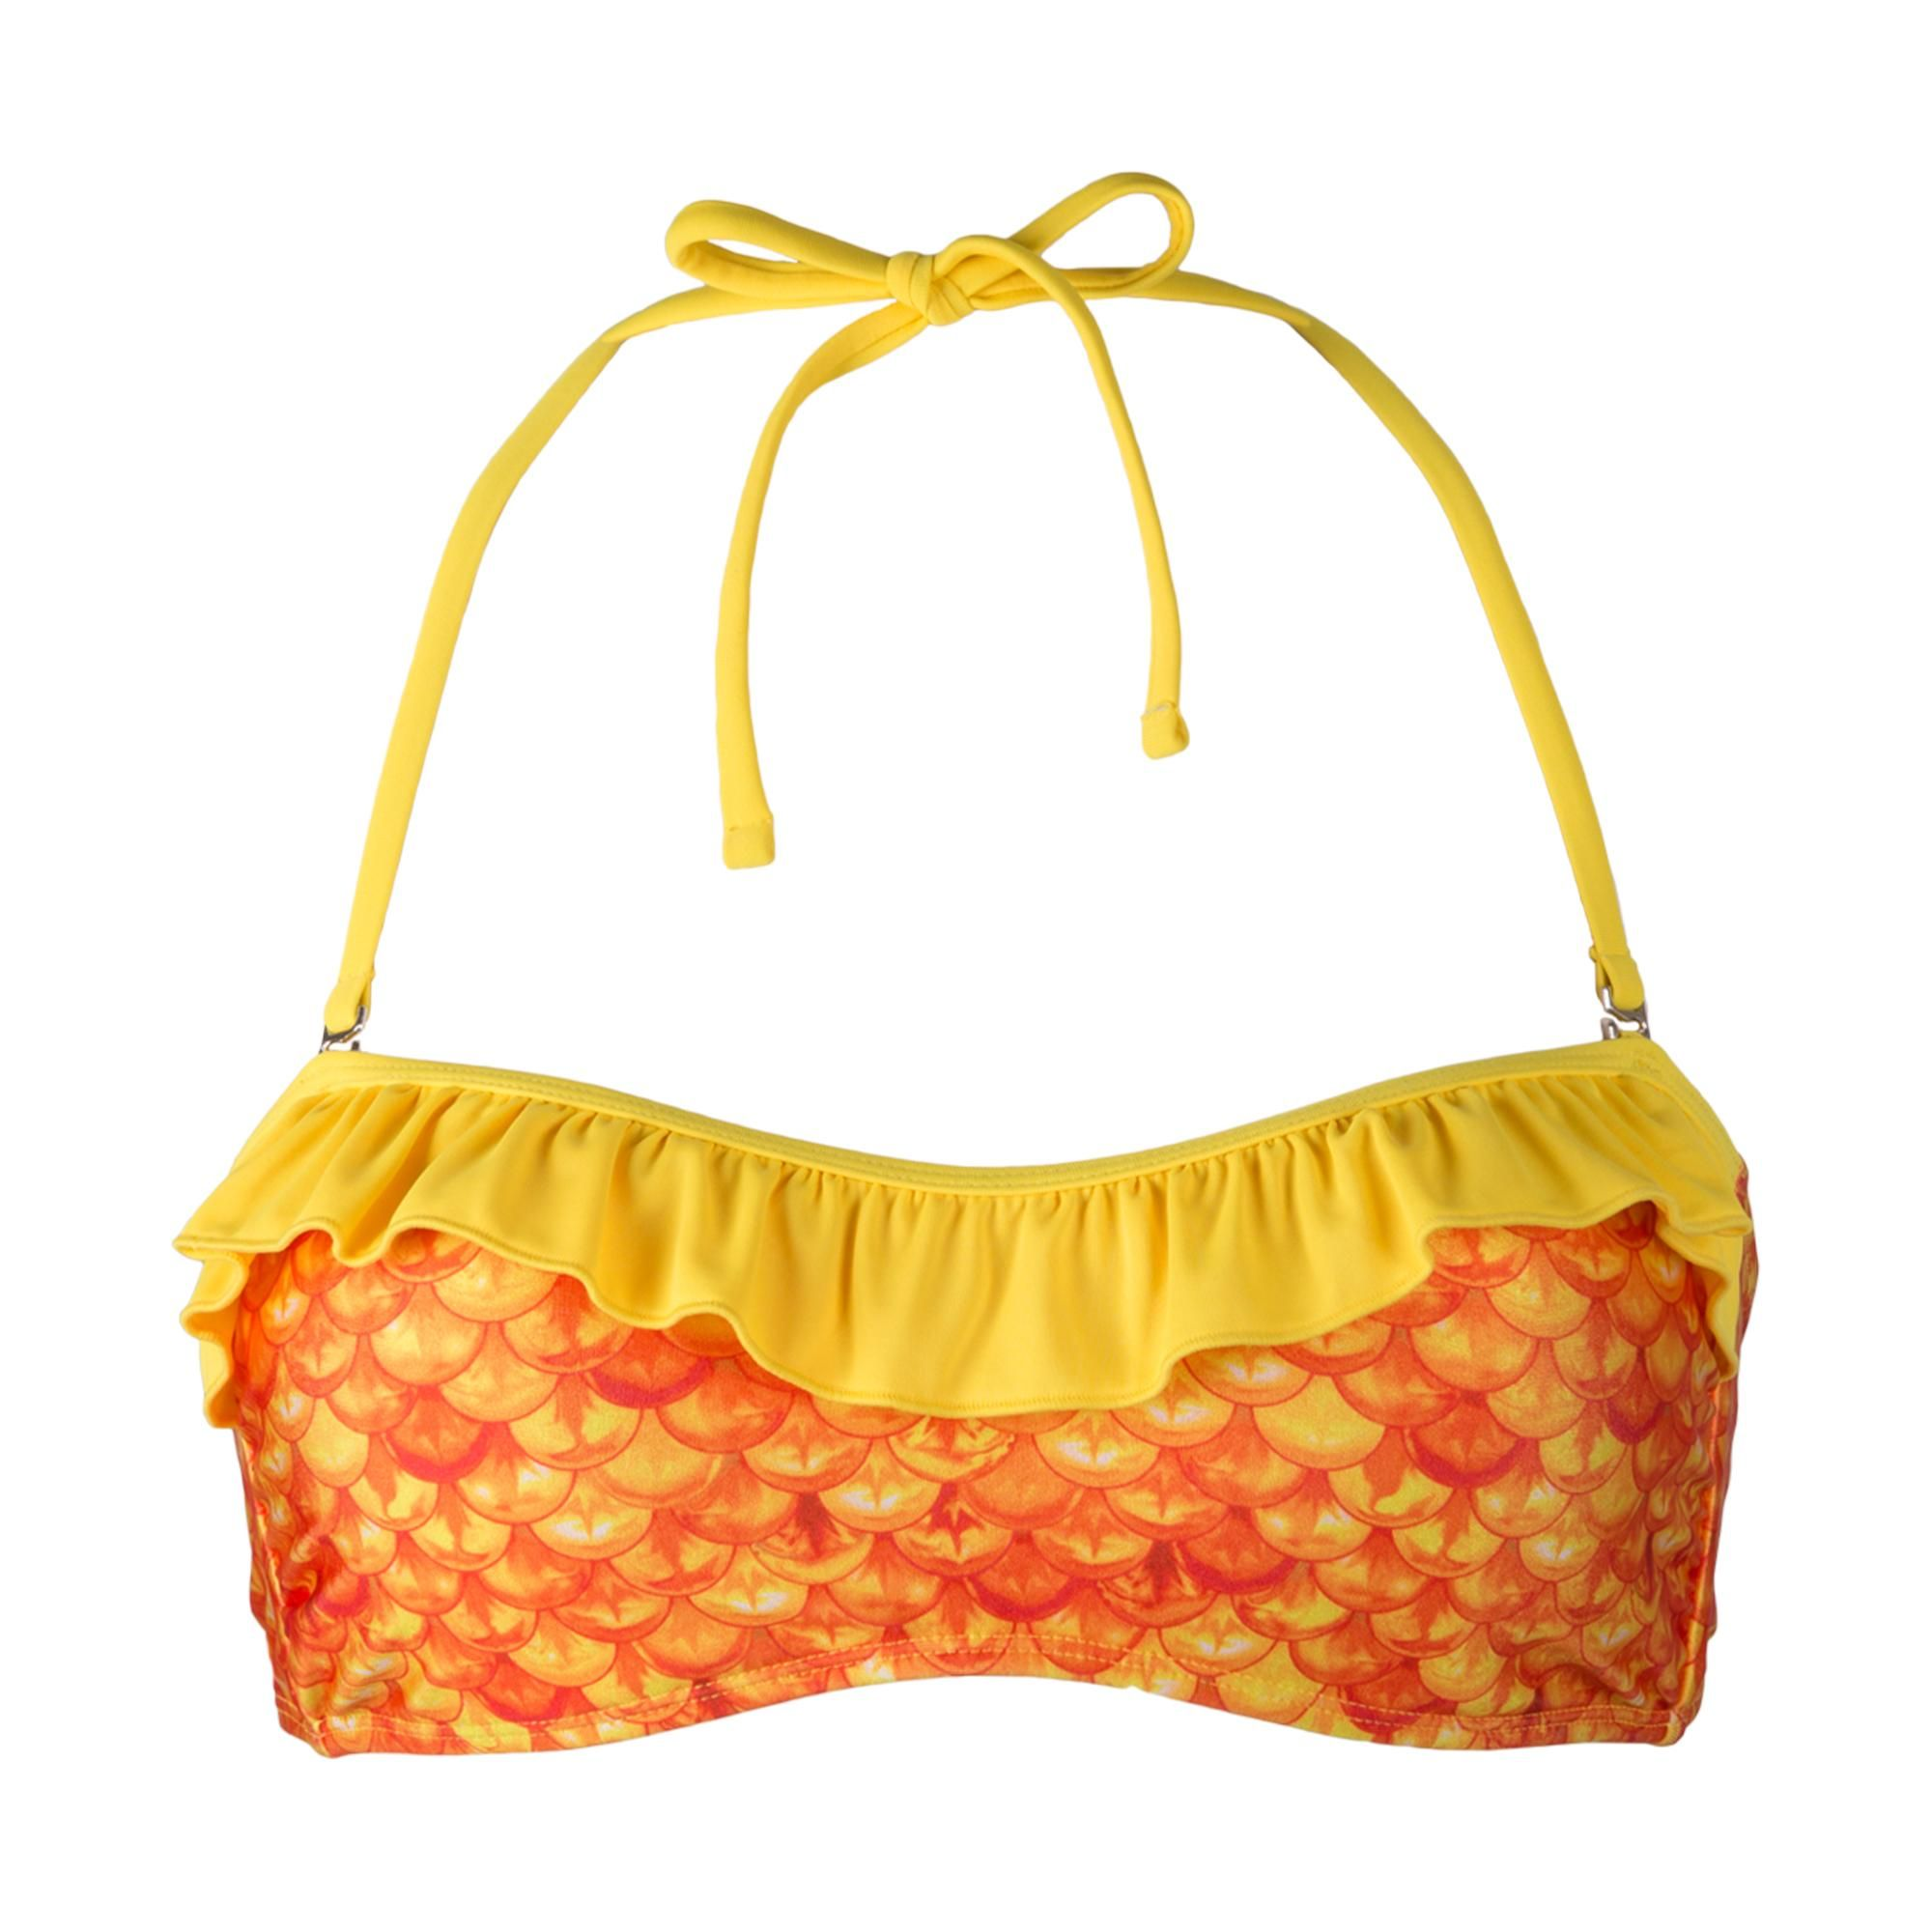 38d3cdc359c50 Tropical Sunrise Bandeau Bikini Top. Tap to expand